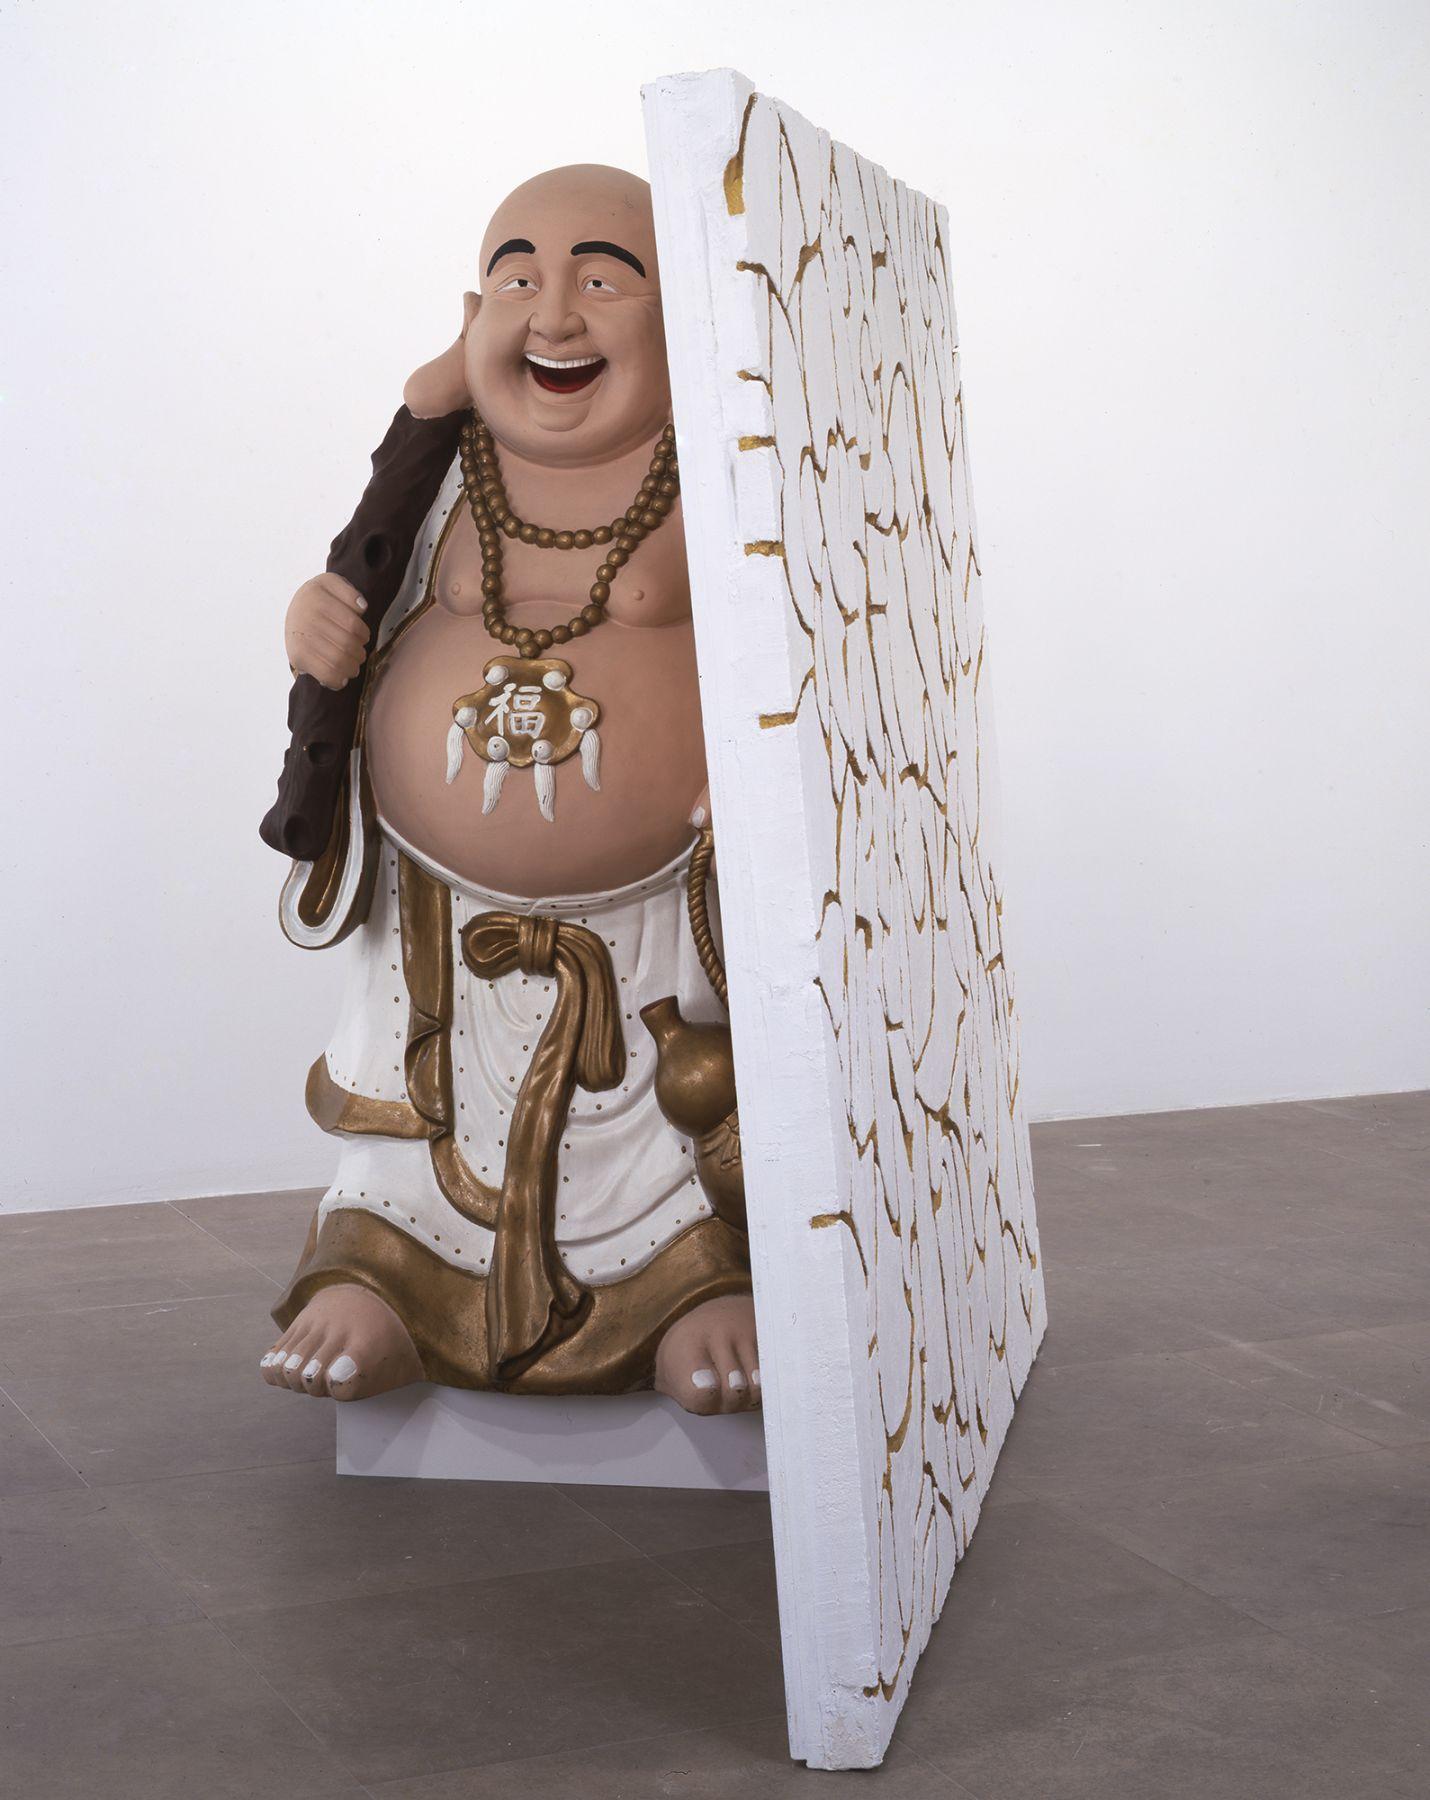 Rachel Harrison Buddha with Wall, 2004 Wood, polystyrene, cement, acrylic, and fiberglass Buddha 80 x 82 x 40 inches (203.2 x 208.3 x 101.6 cm)